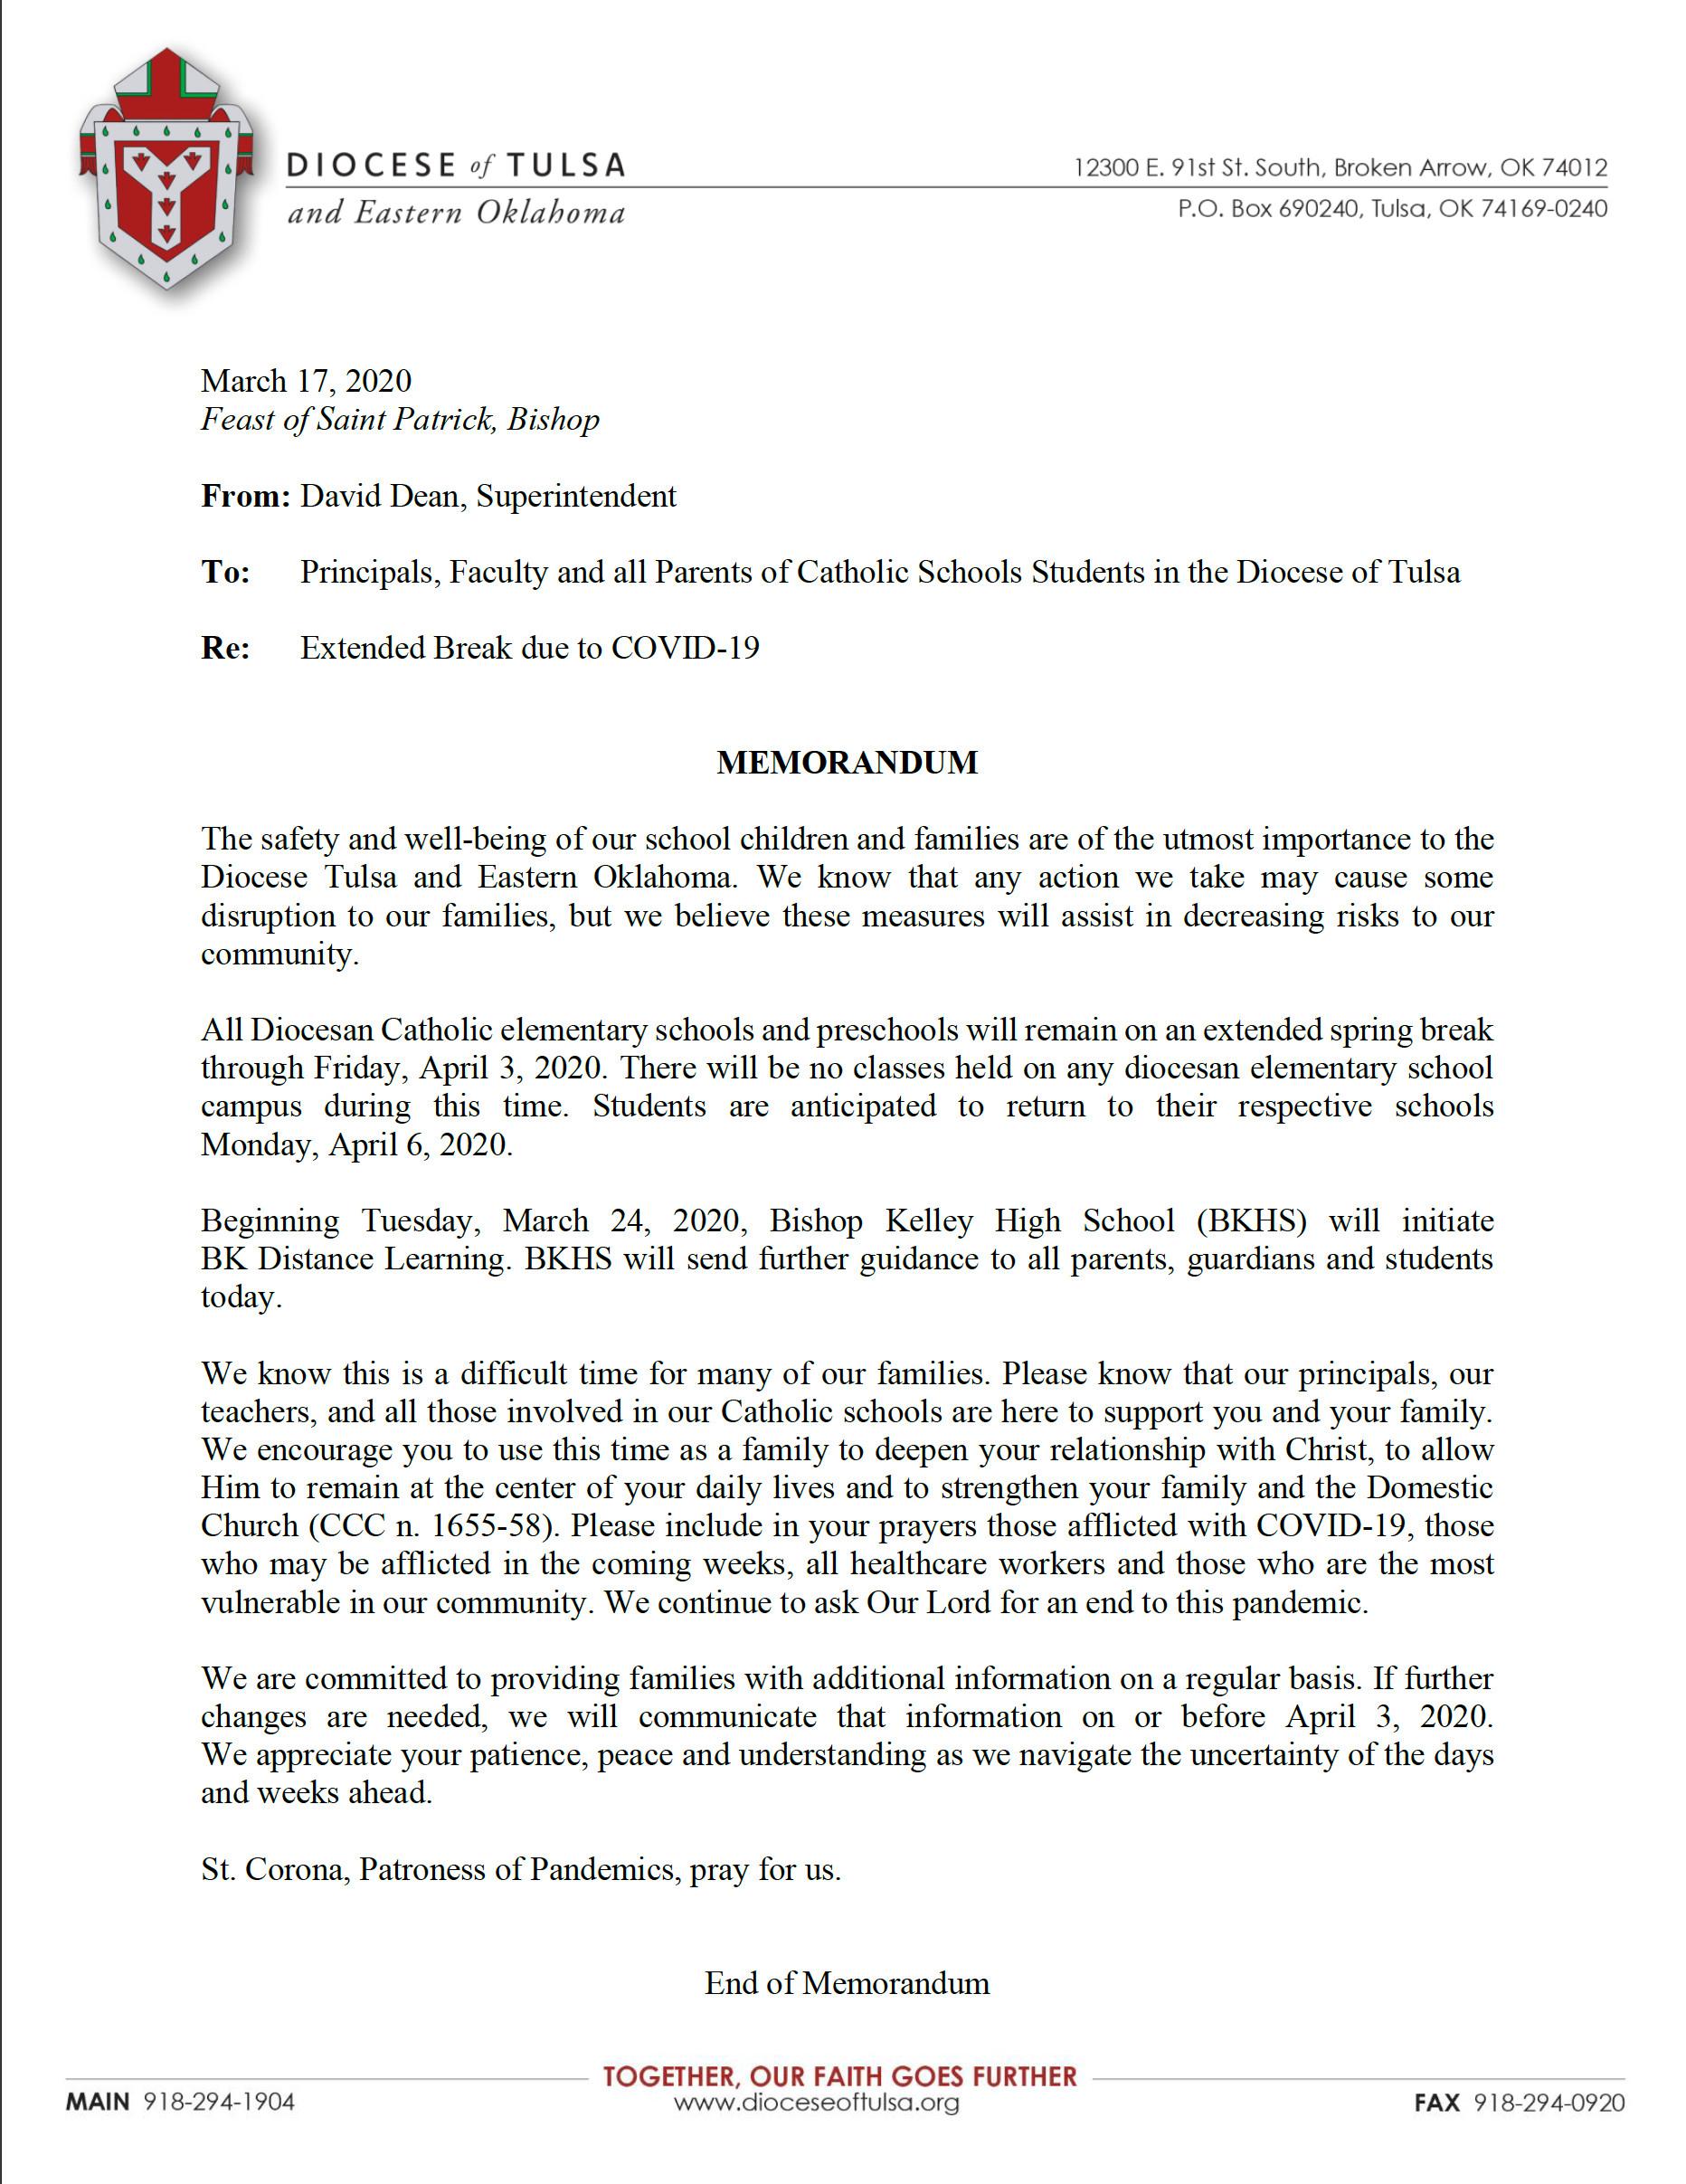 Spring Break Extended Through April 6 – School Of Saint Mary Within Broken Arrow High School Spring Break